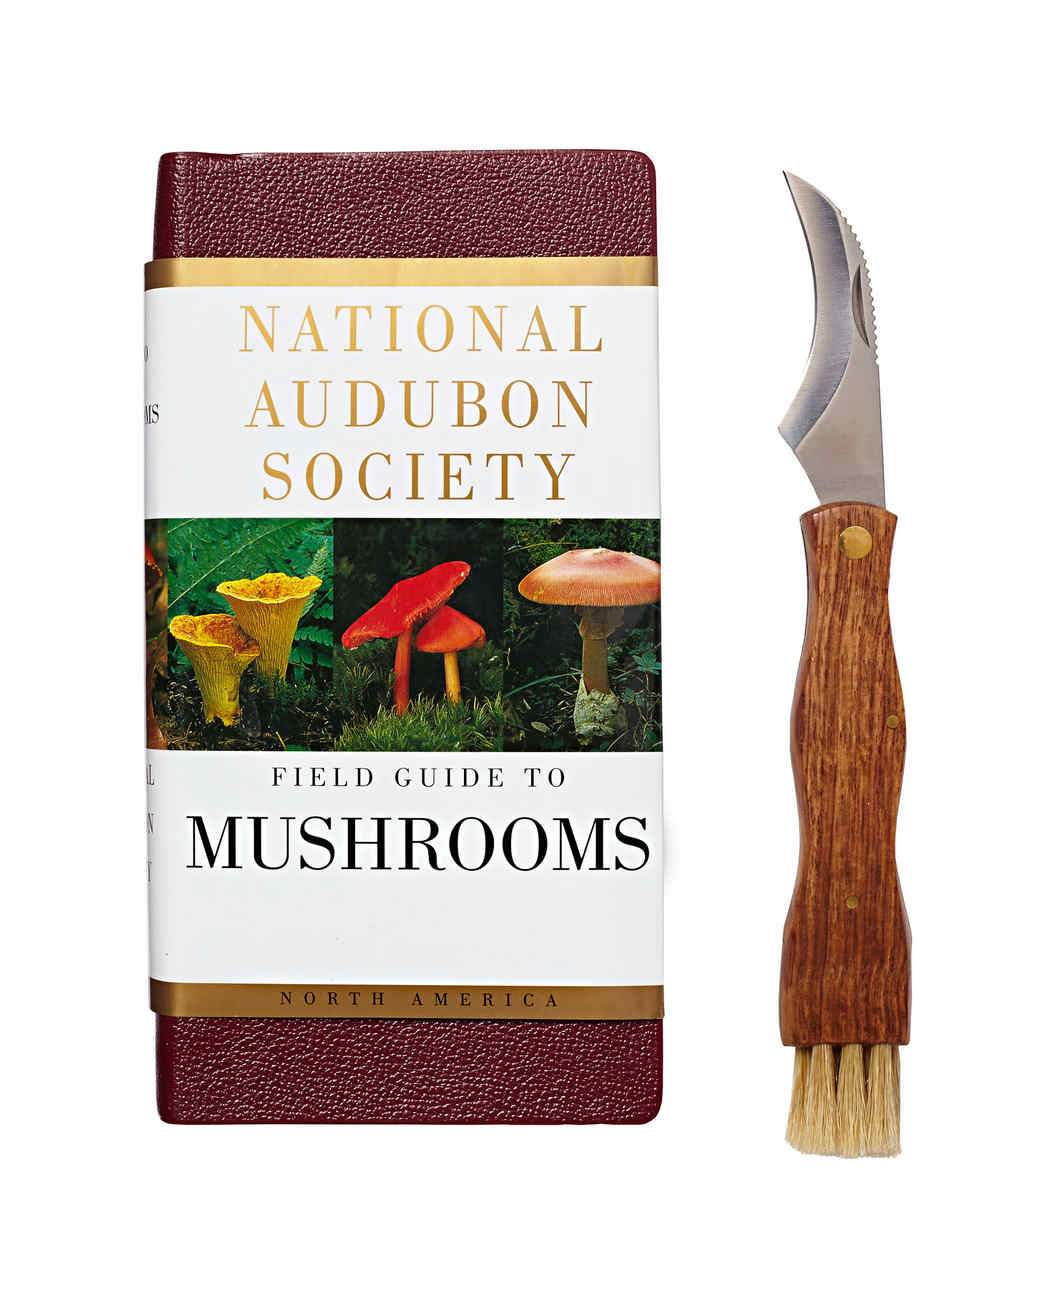 national audubon society mushroom guide